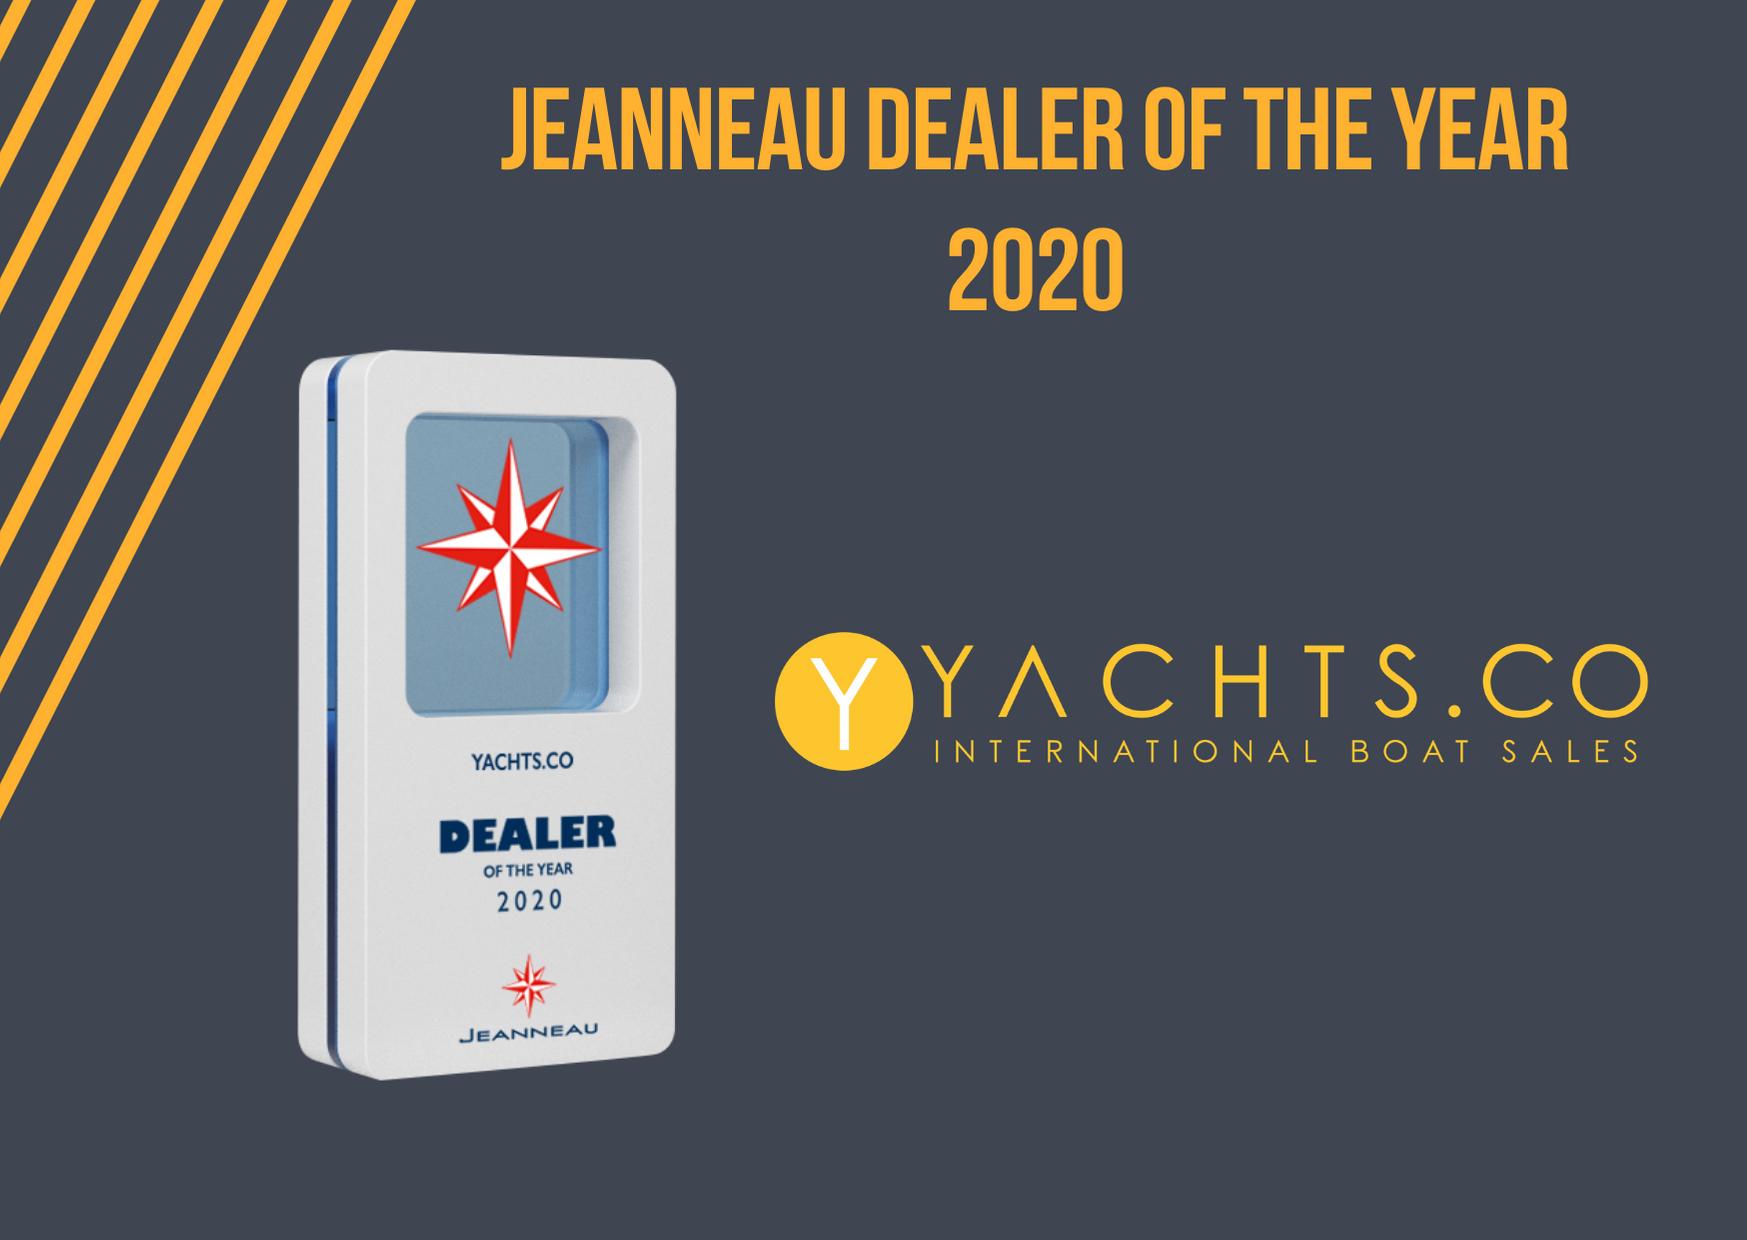 Jeanneau dealer of the year 2020